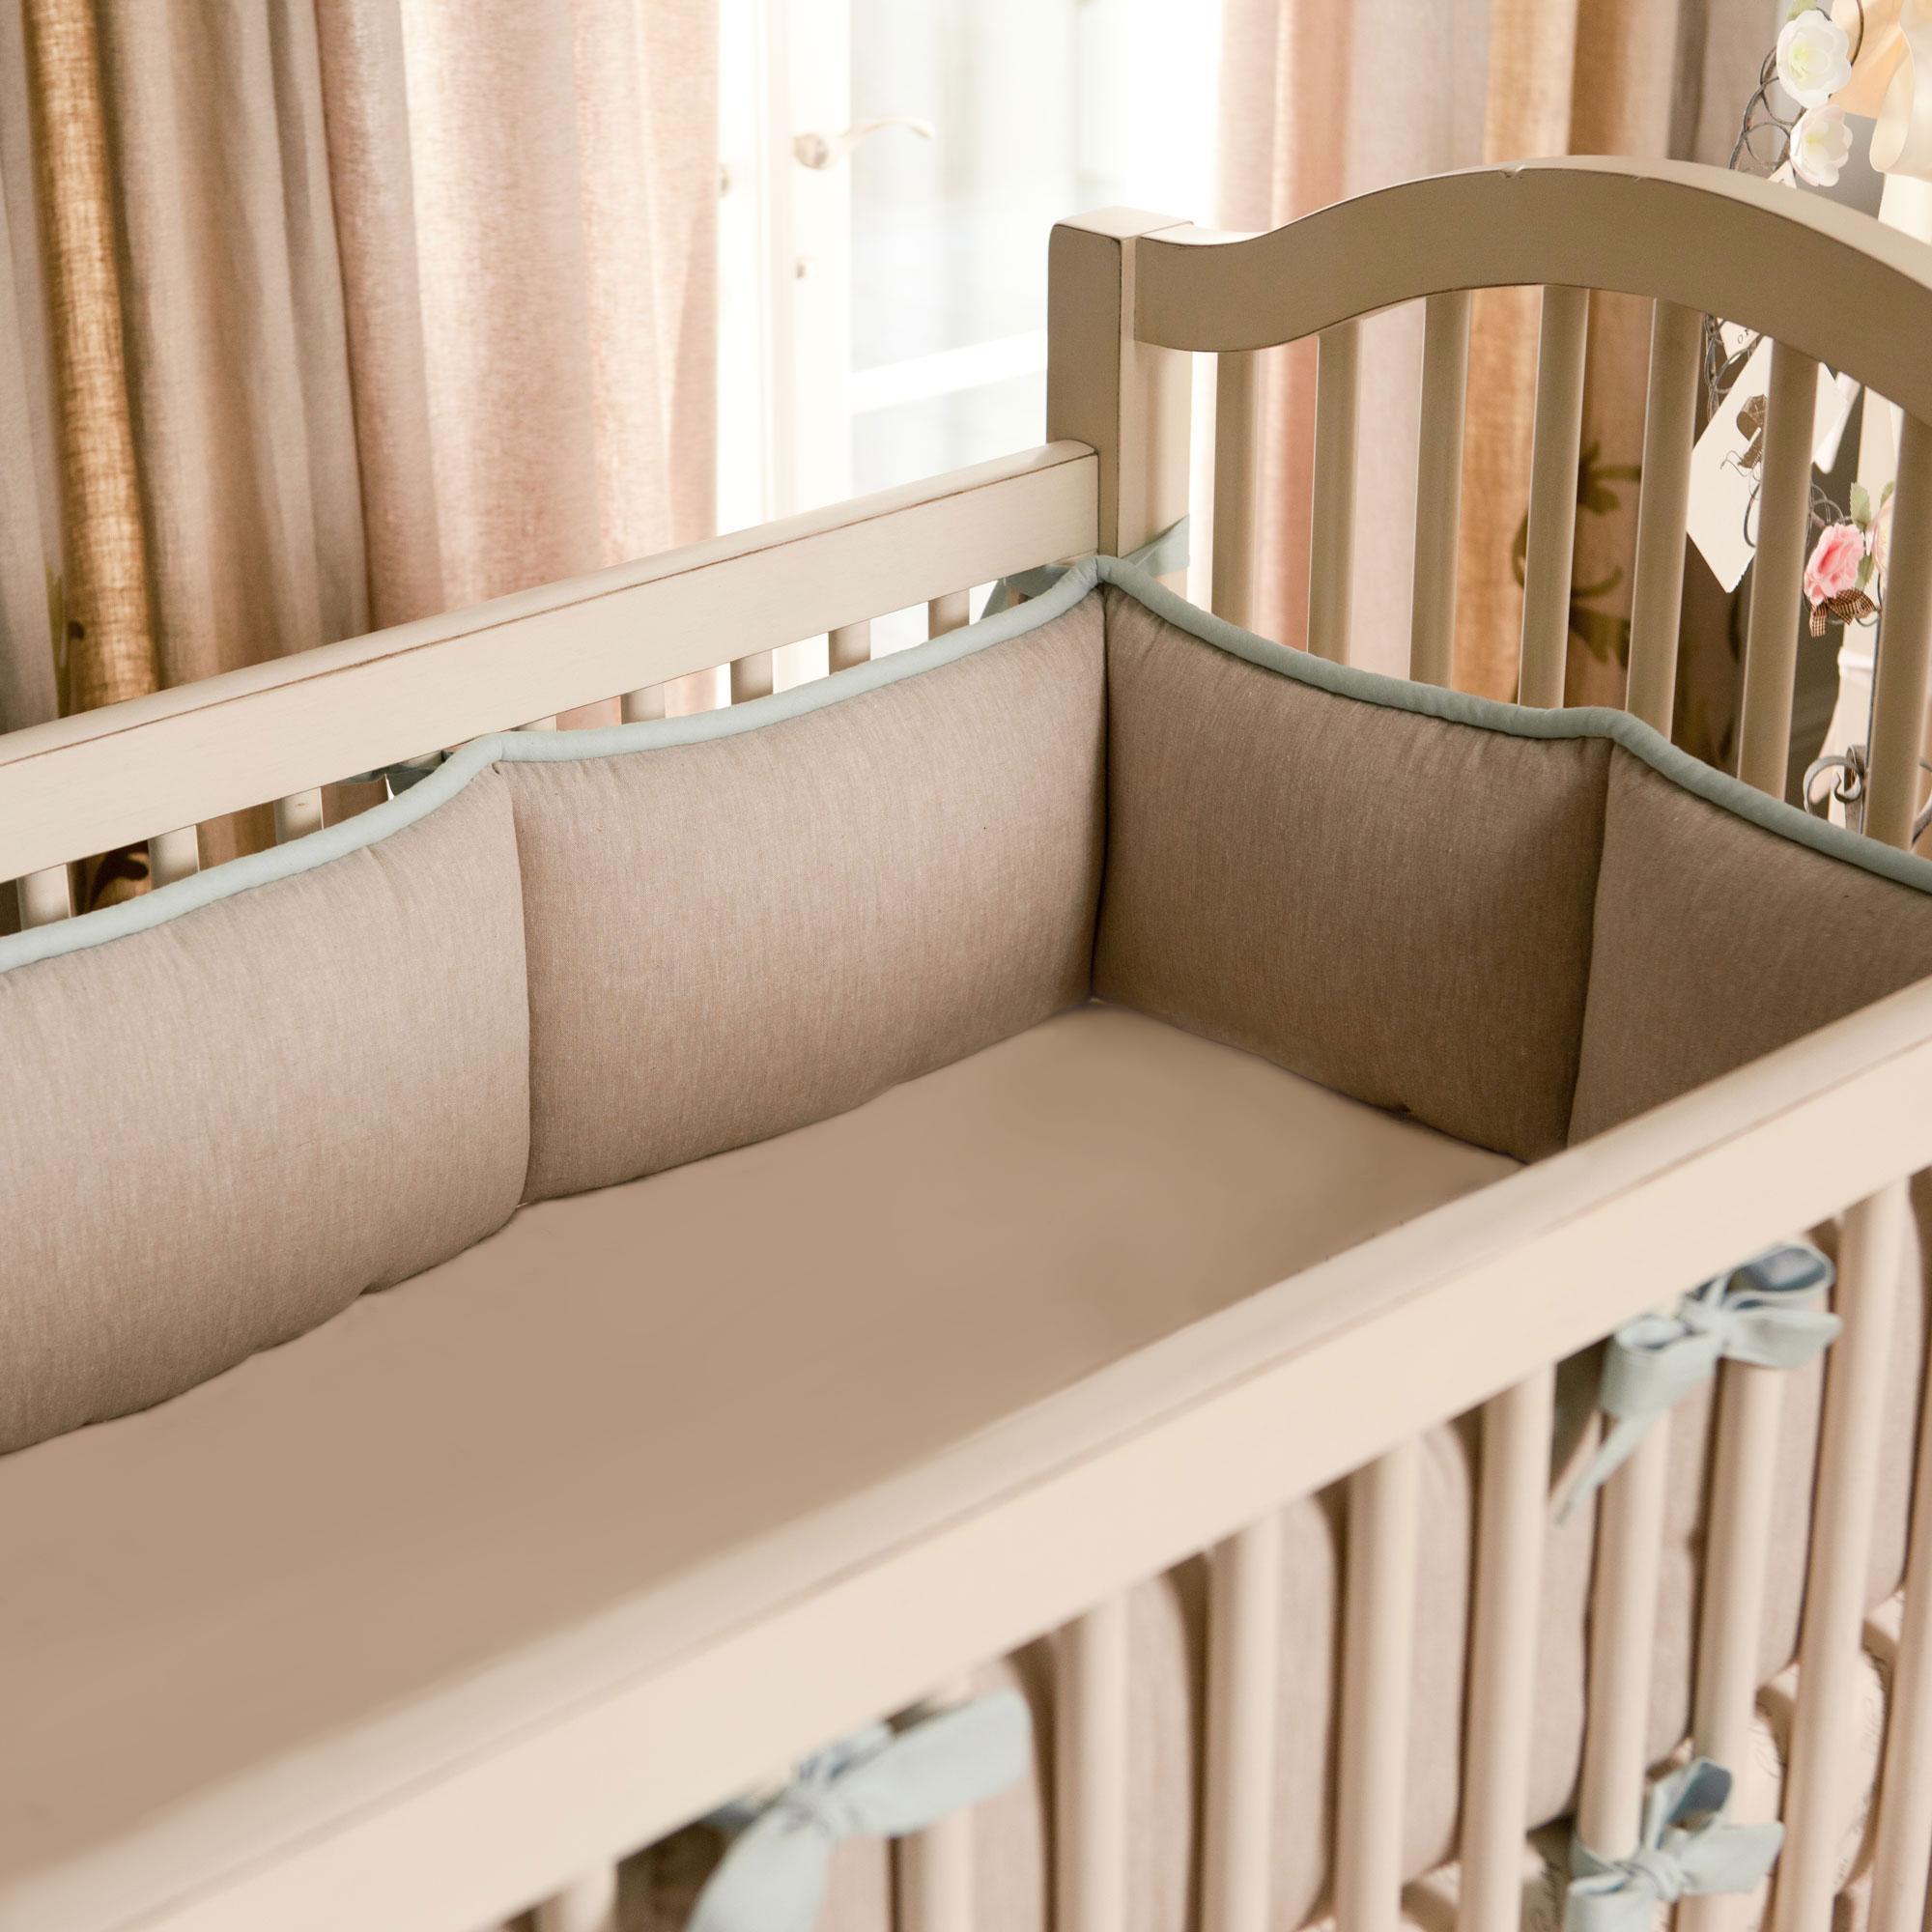 Crib Bumpers | Turquoise Crib Bumper | Babies R Us Bedding